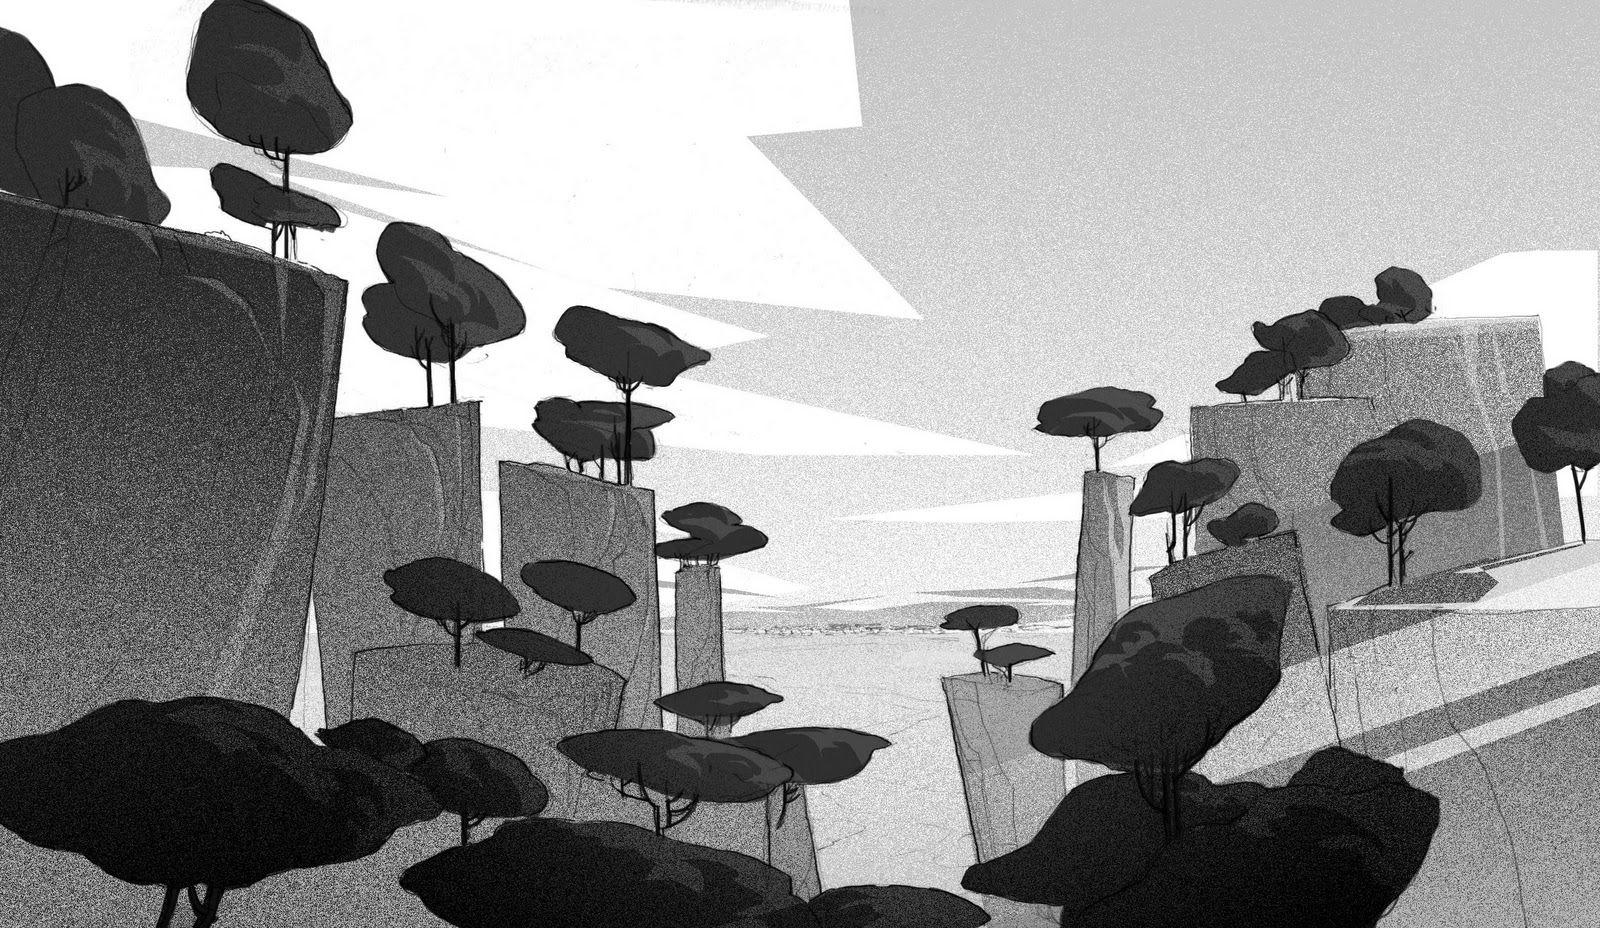 Illustrator: Santiago Montiel